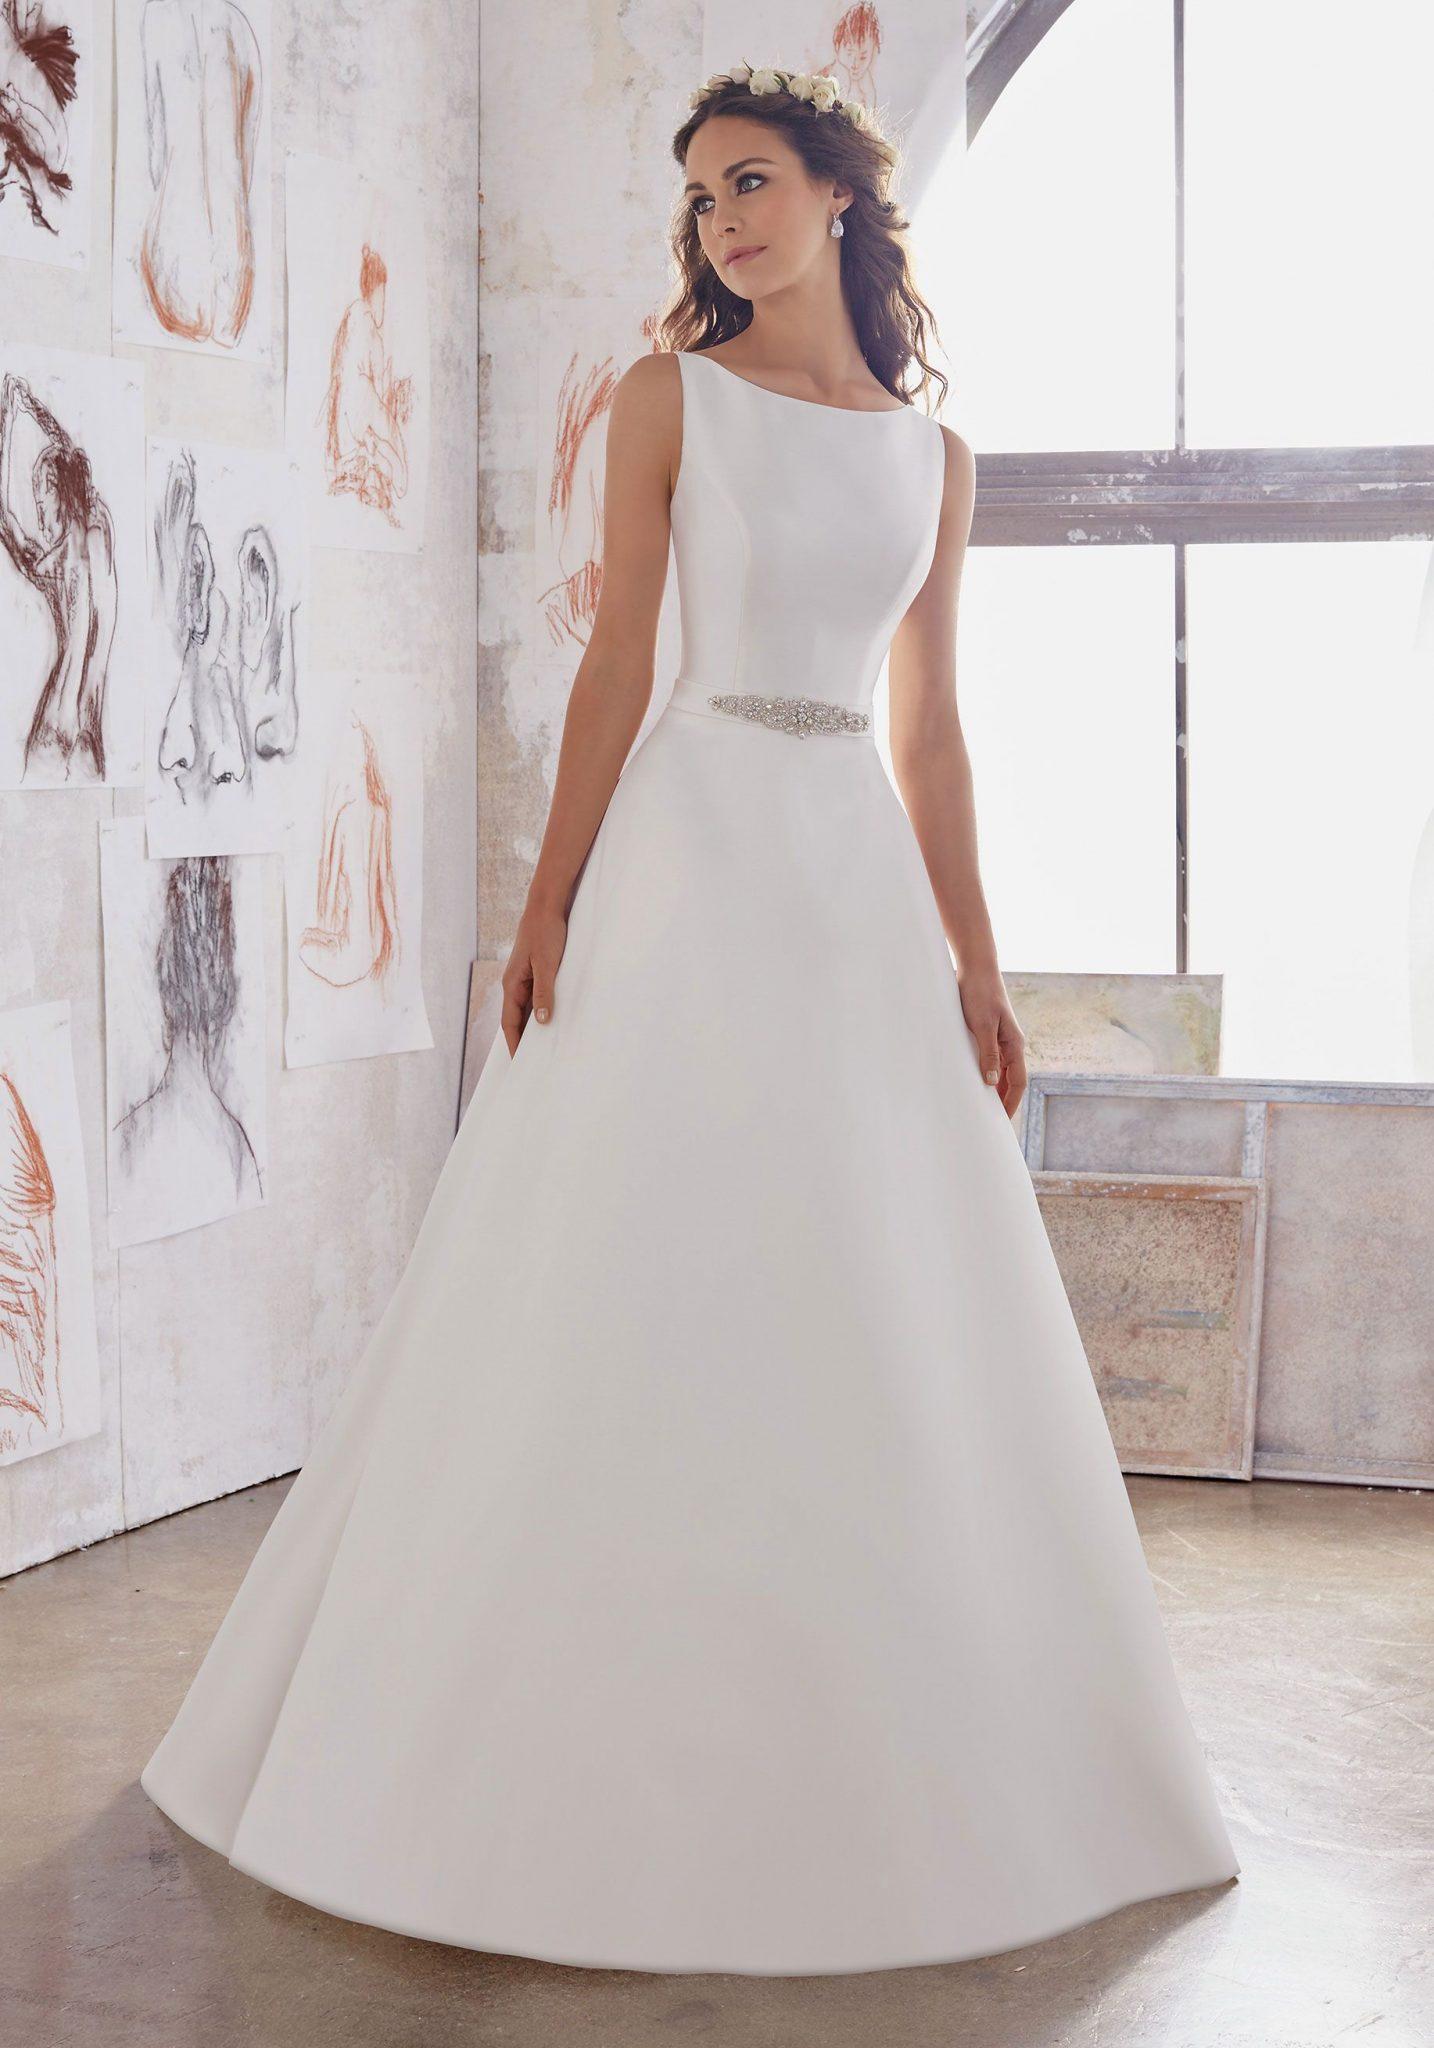 White Simple Wedding Dresses Beach